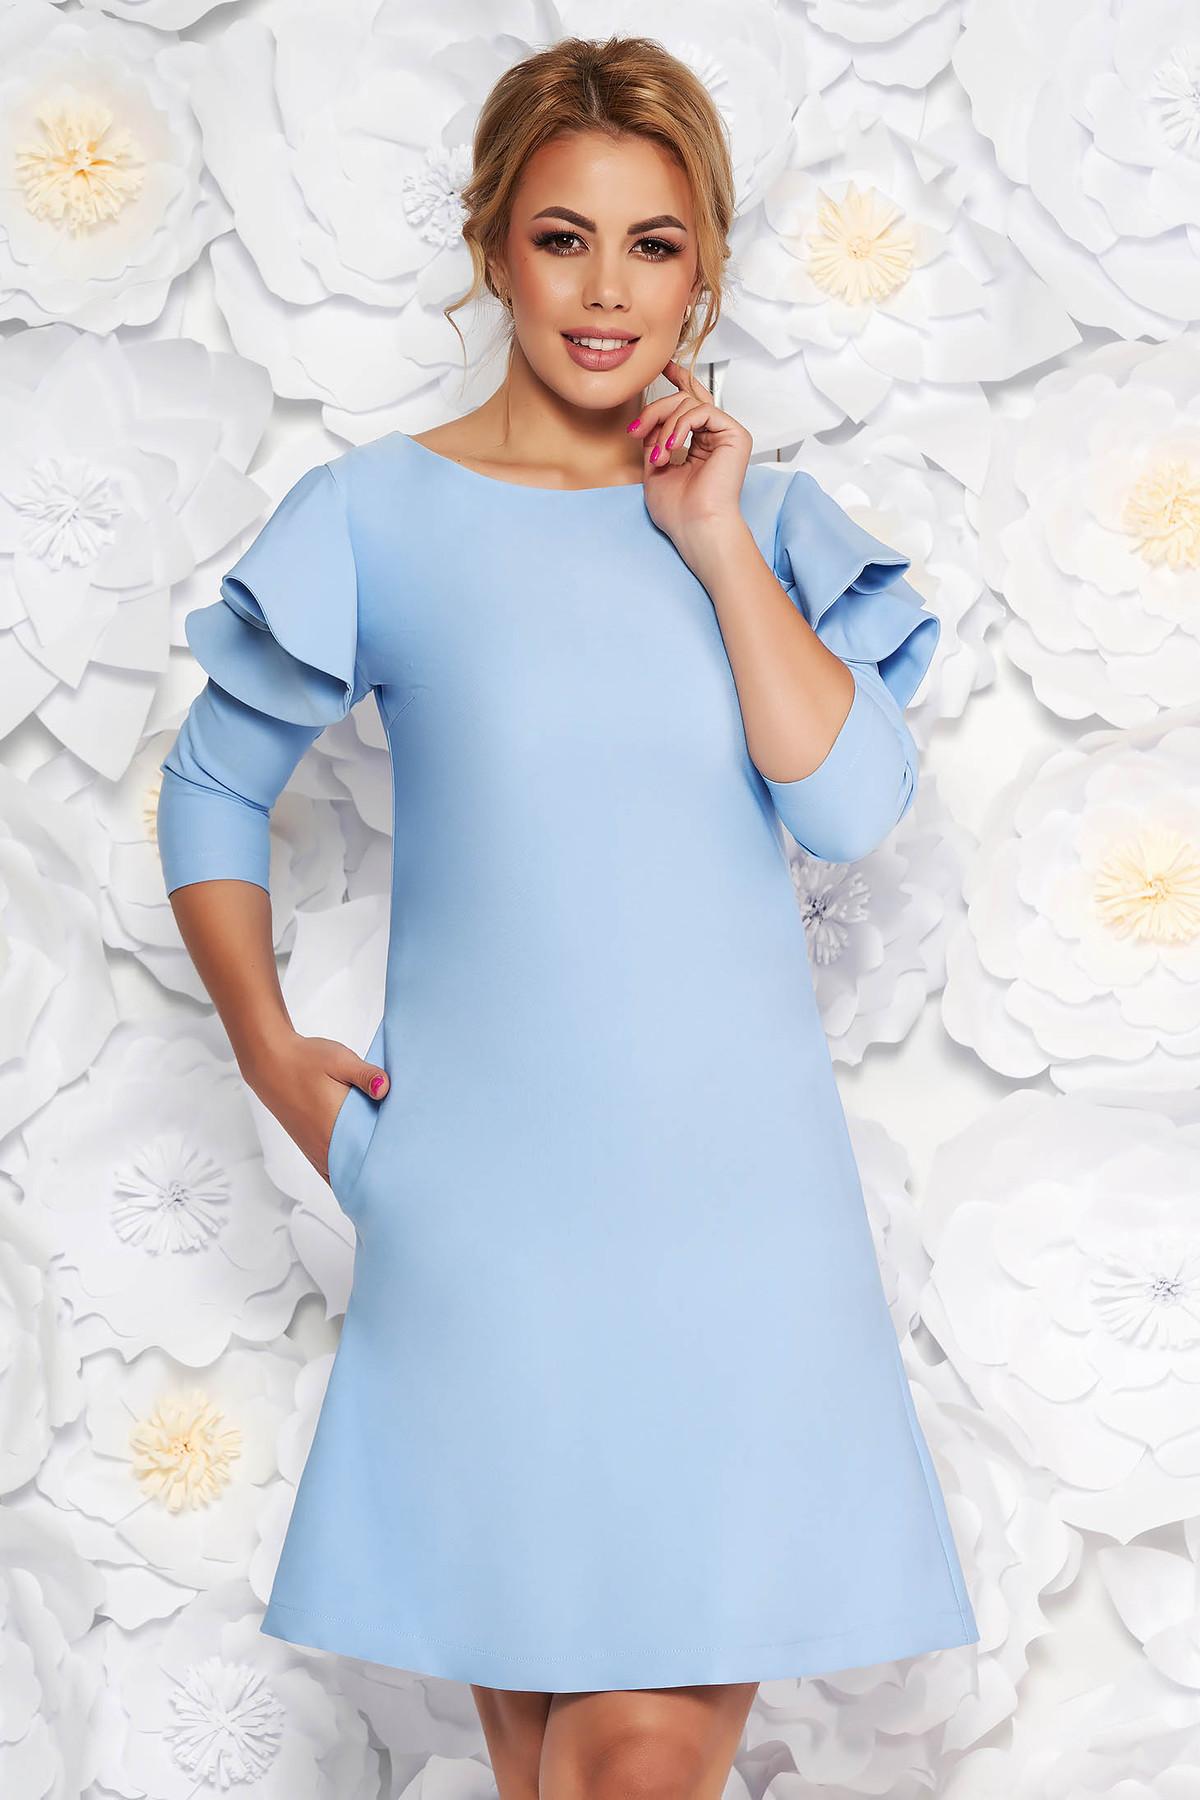 Rochie LaDonna albastra-deschis cu croi larg din stofa usor elastica cu volanase la maneca